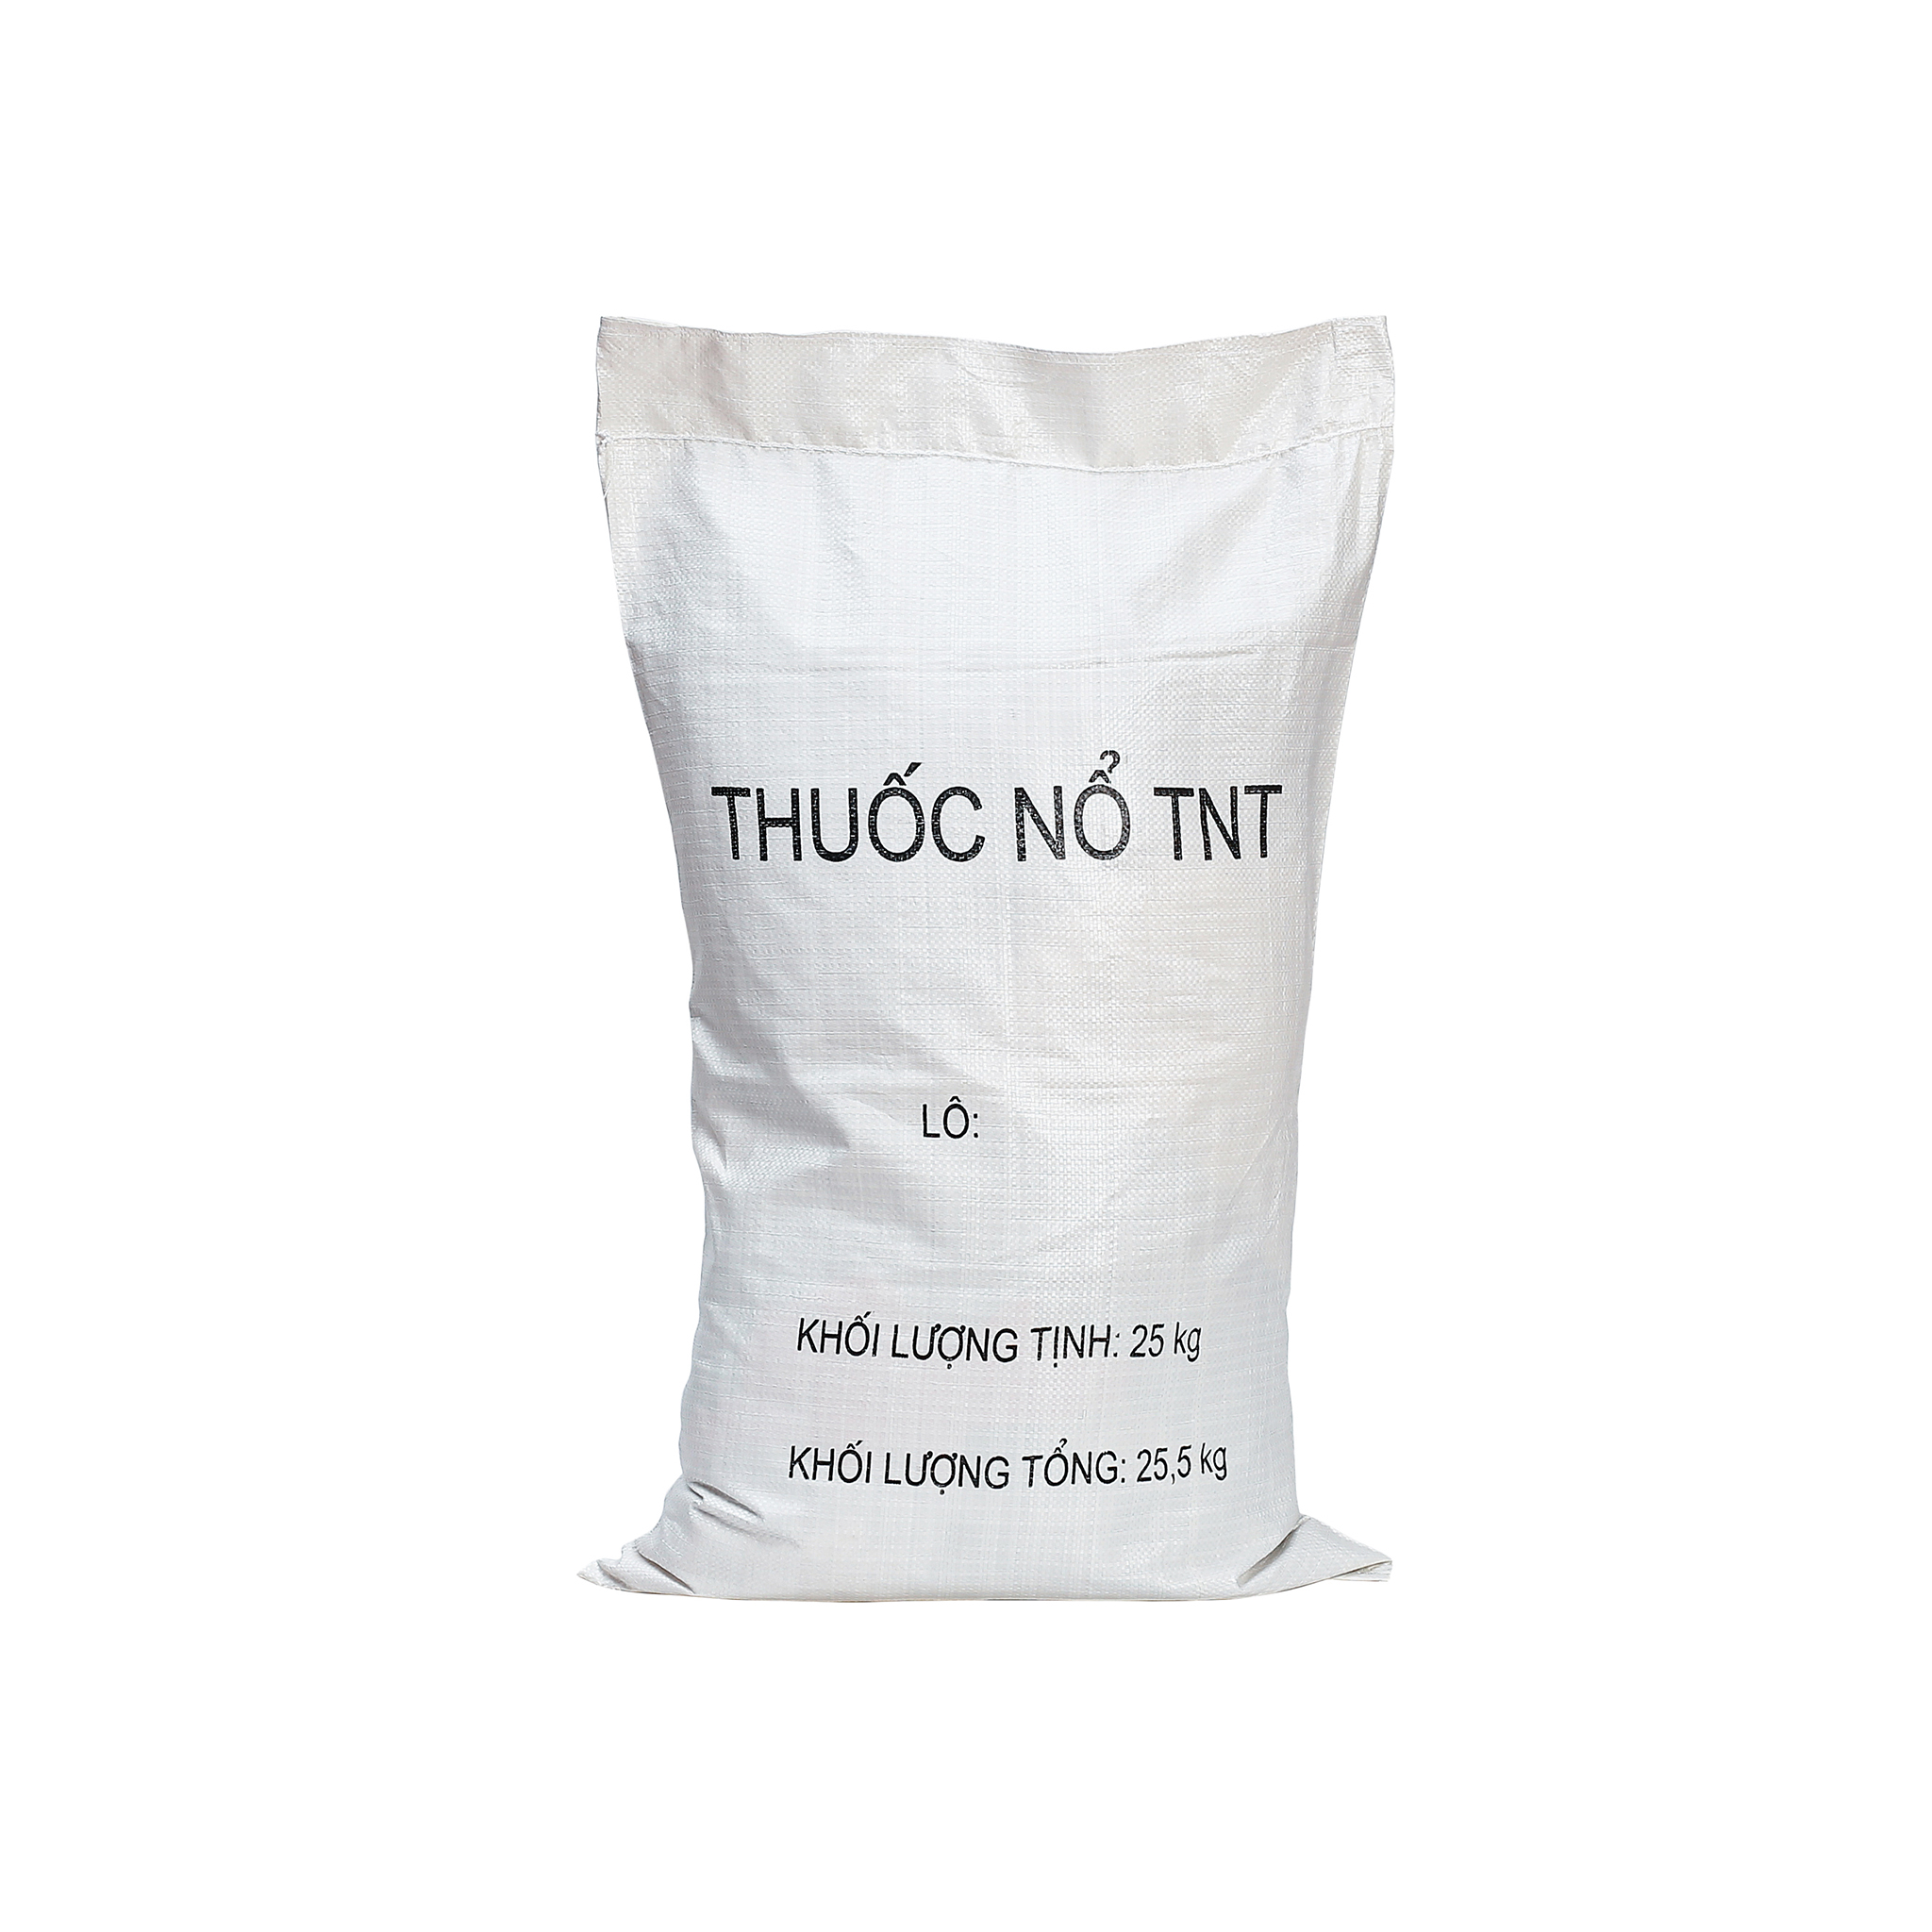 THUỐC NỔ TNT